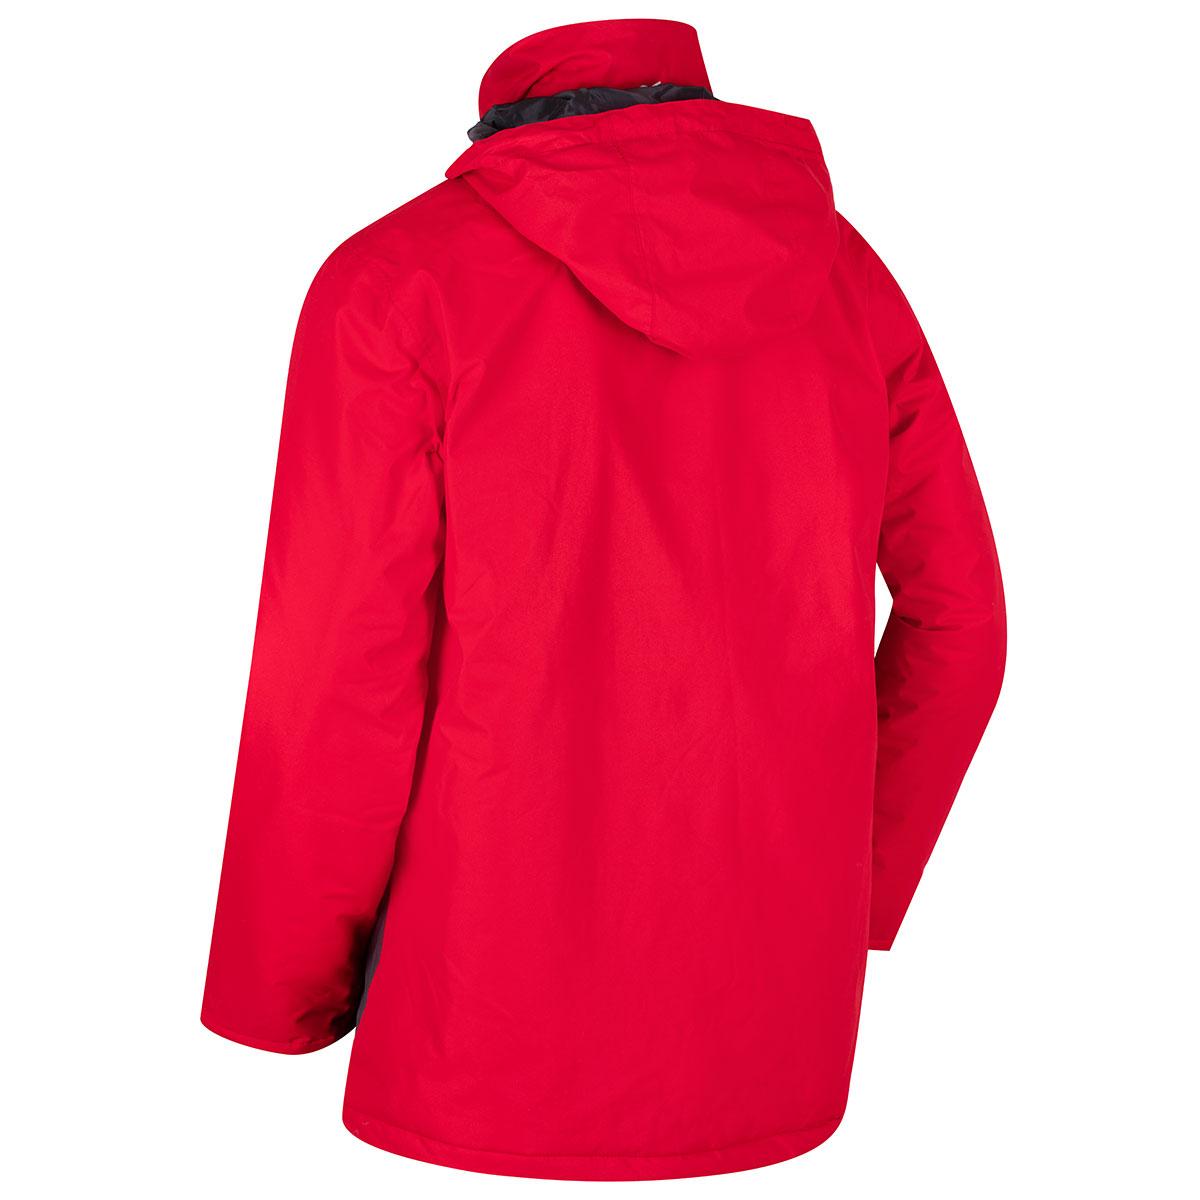 Regatta-Mens-Thornridge-Thermal-Waterproof-Jacket-69-OFF-RRP thumbnail 13